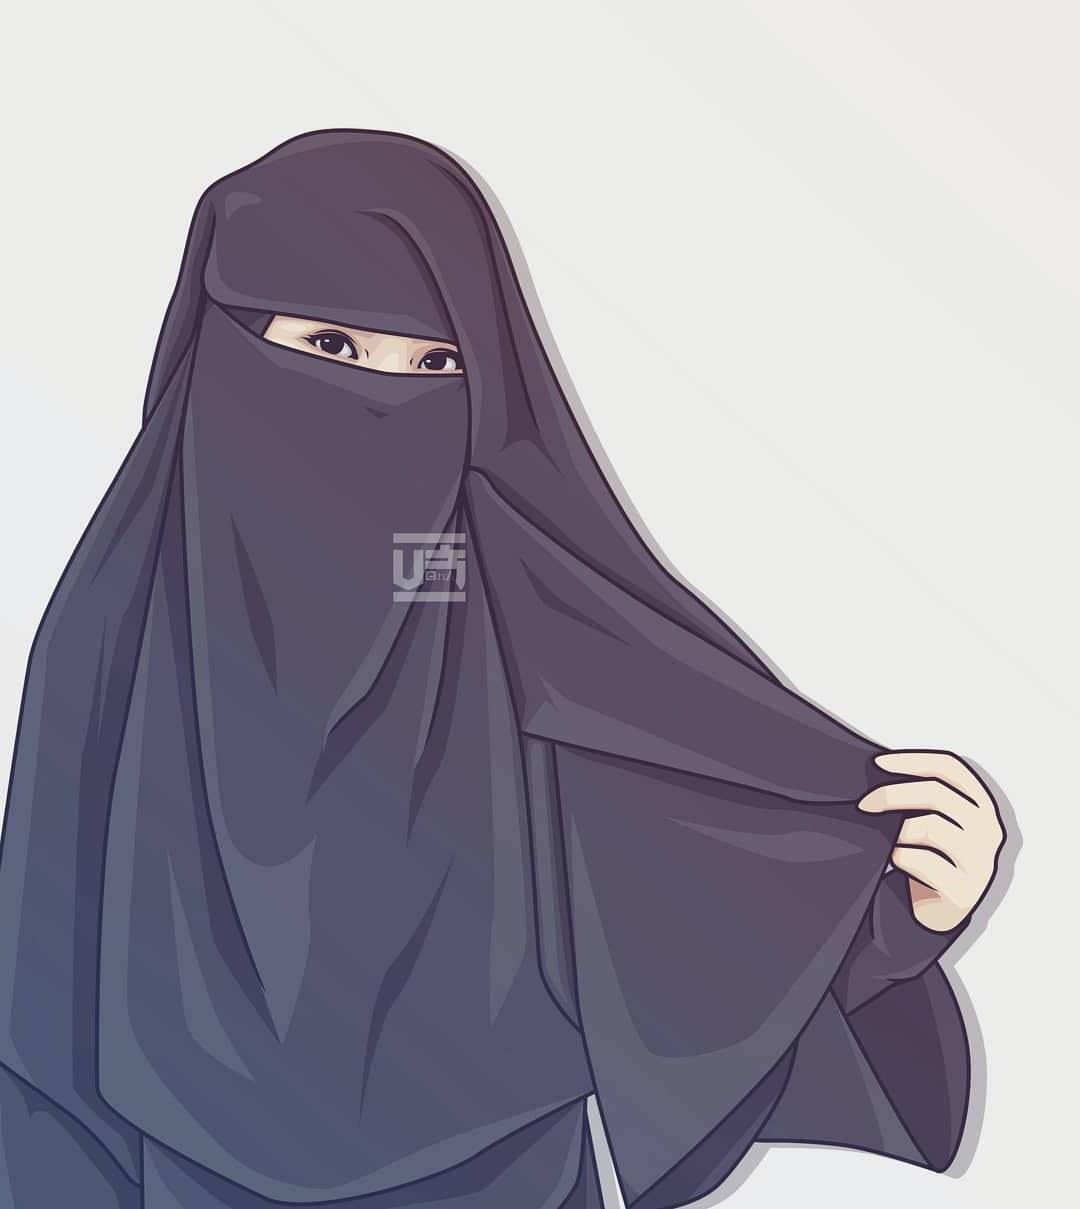 Inspirasi Muslimah Kartun Bercadar Zwdg Menakjubkan 30 Gambar Kartun Muslimah Bercadar Berkacamata